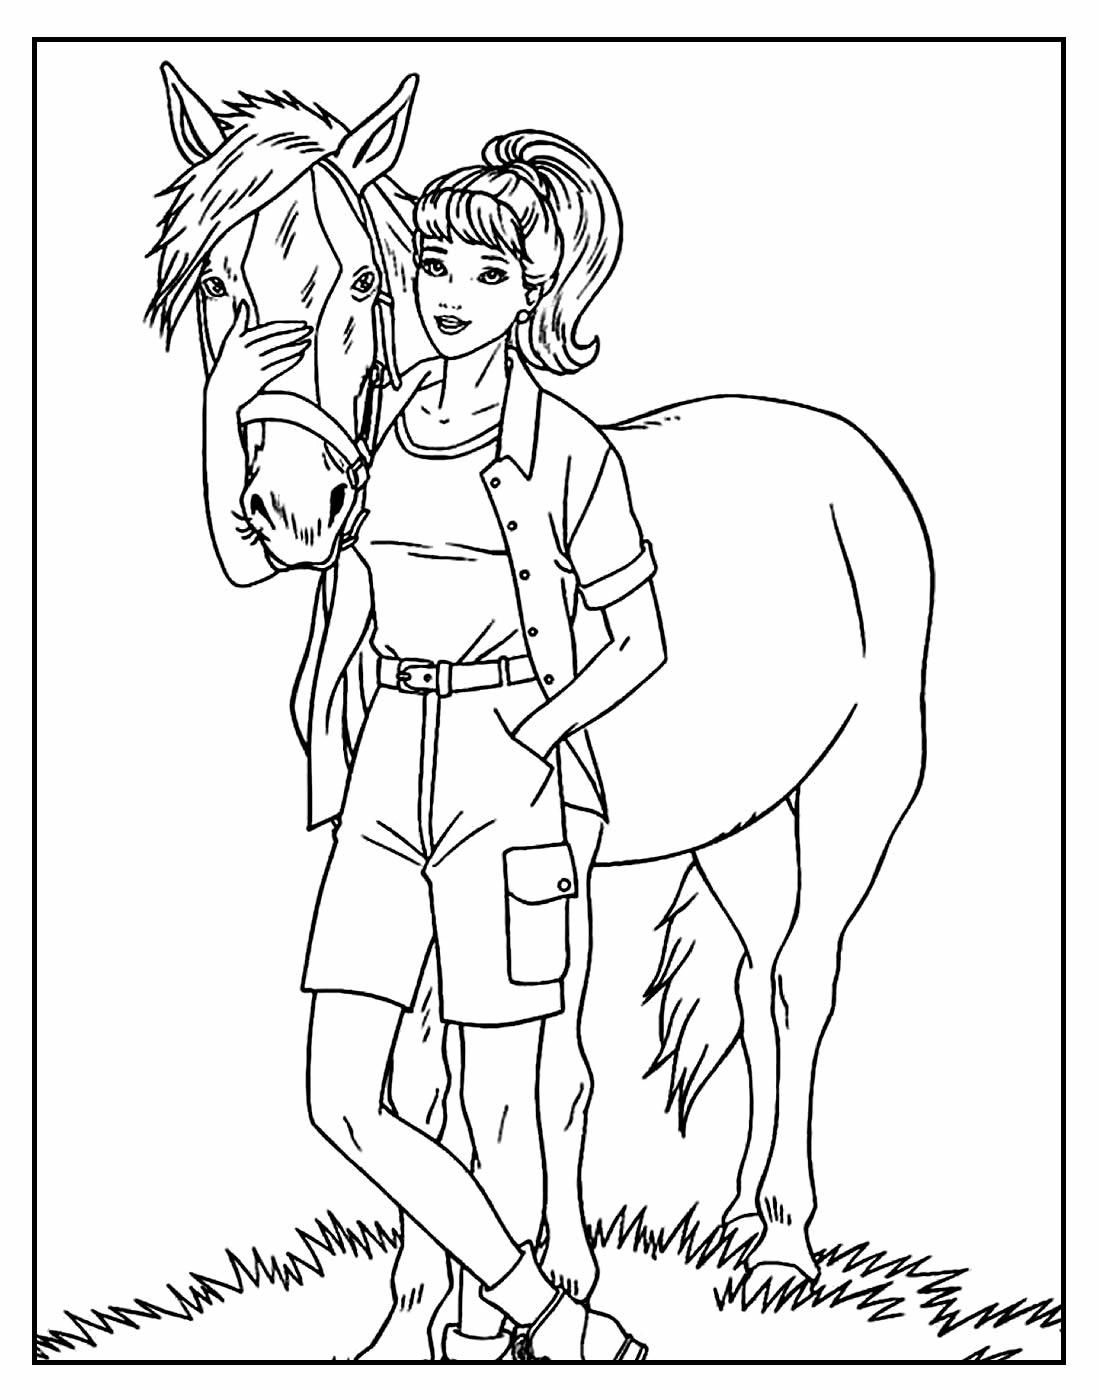 Desenho de Cavalo e Menina para pintar